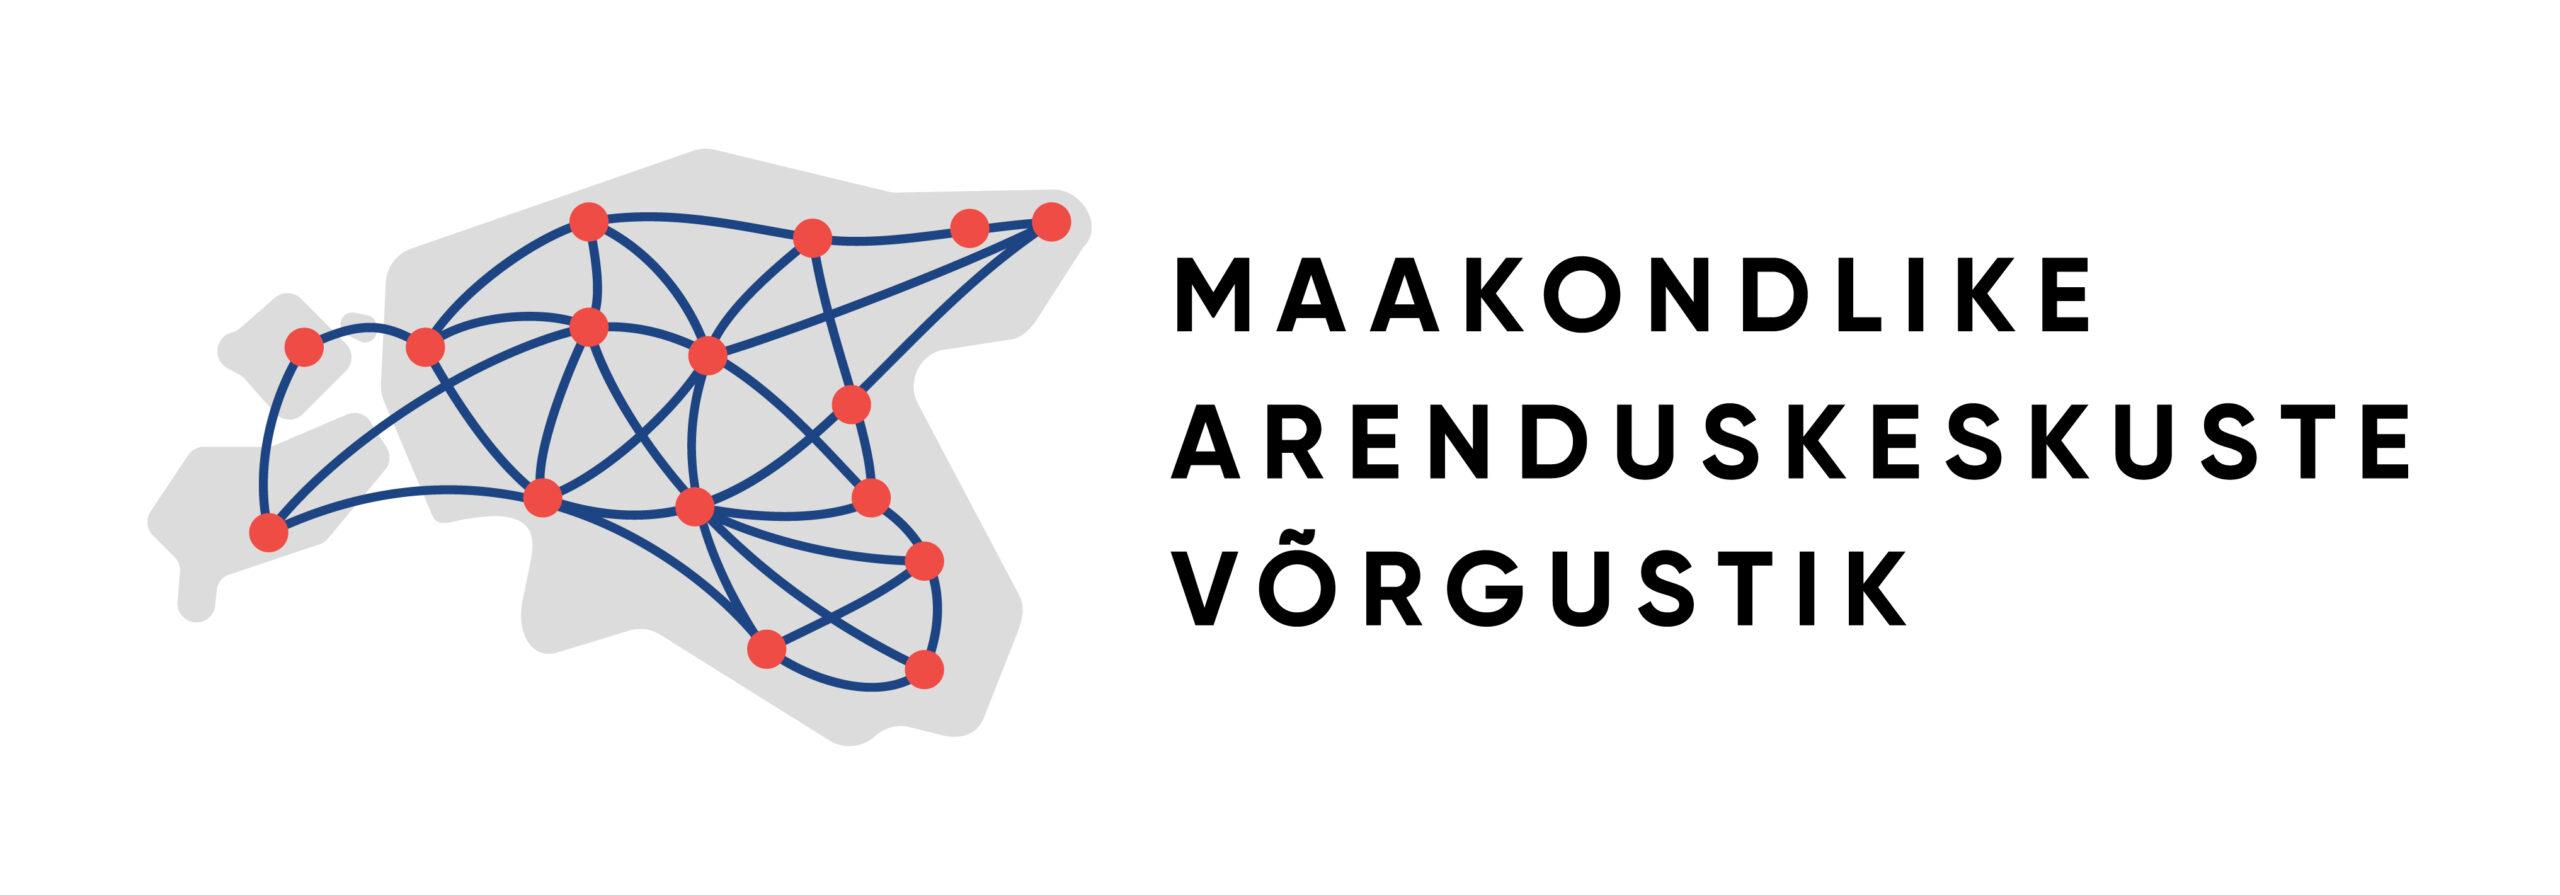 MAK uus logo